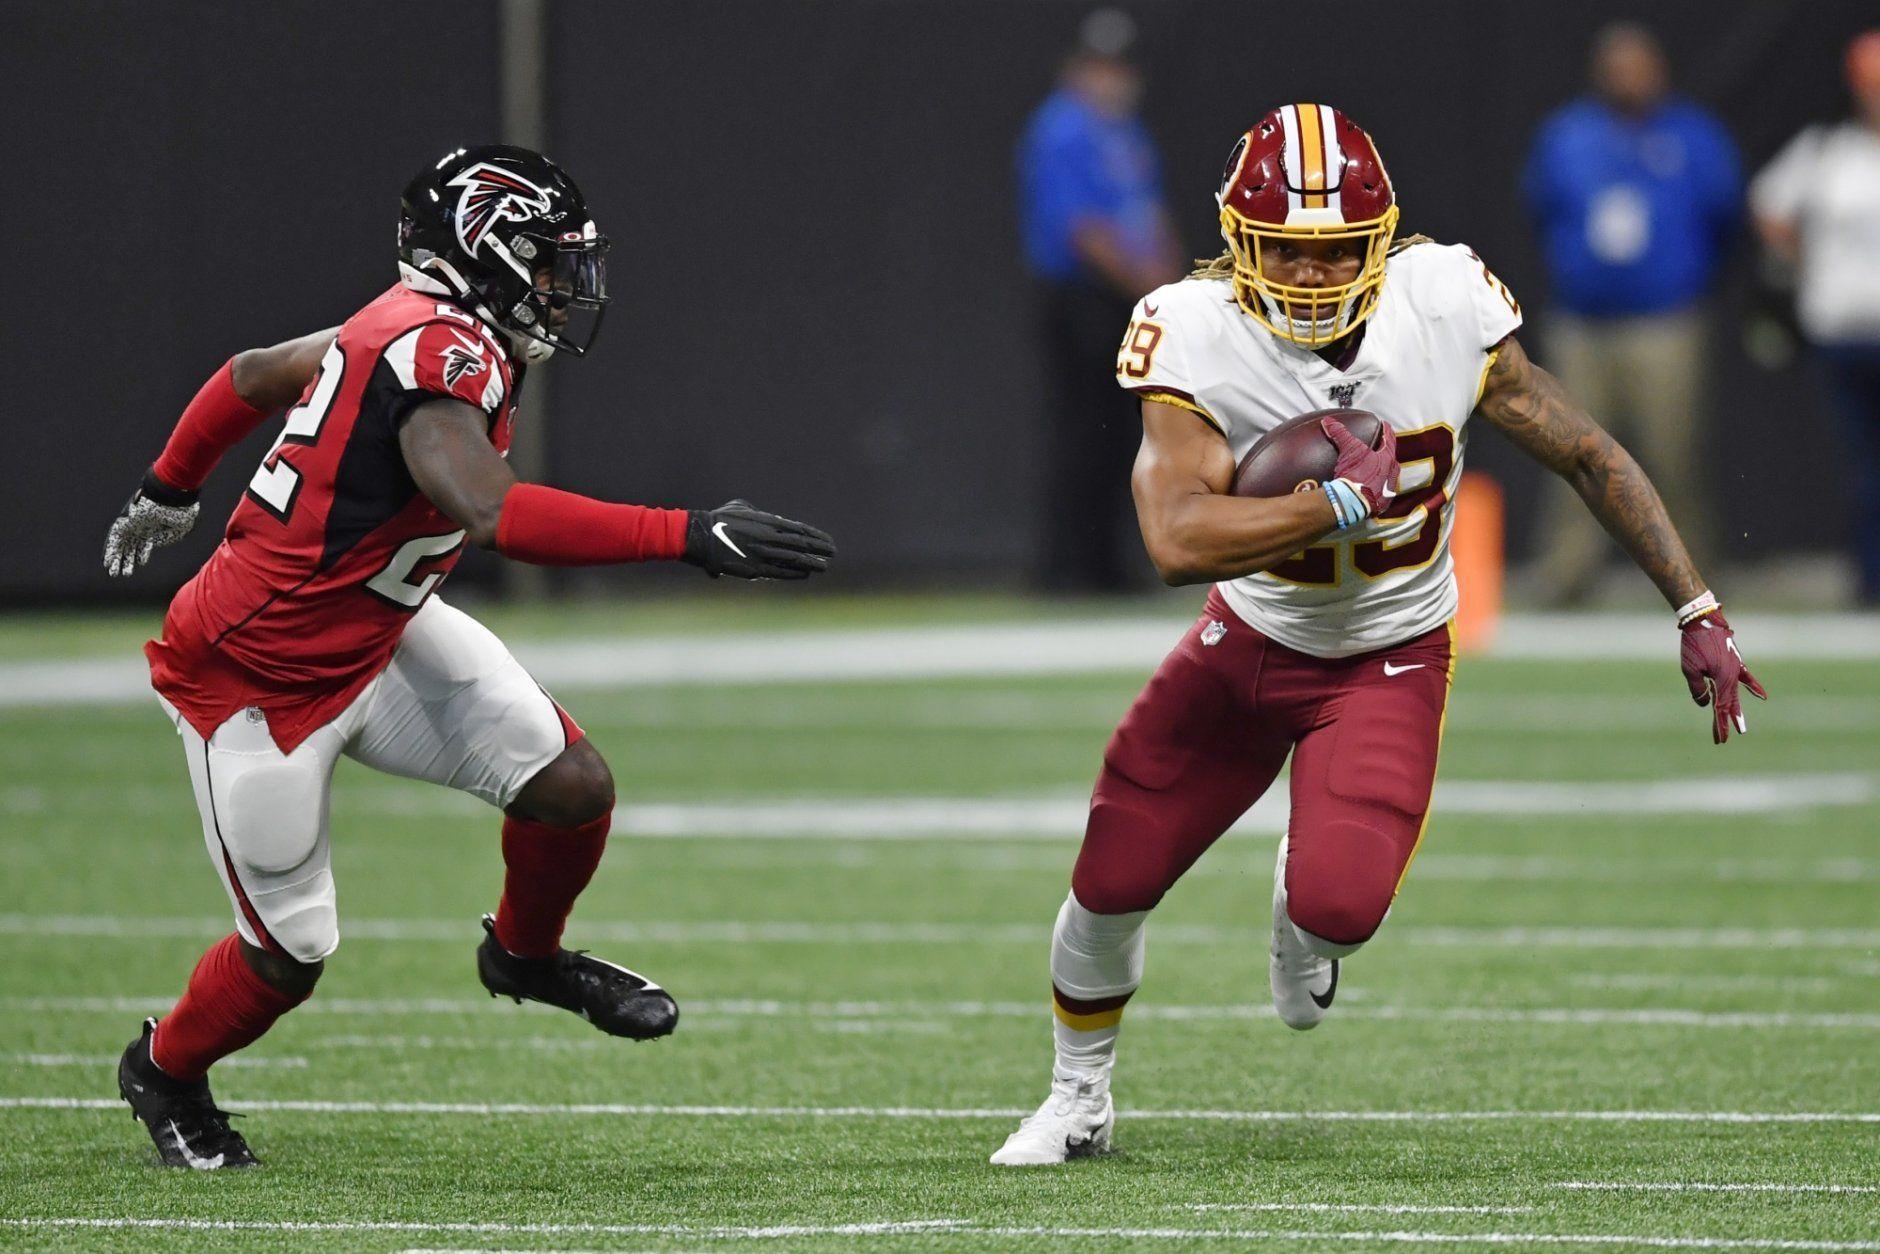 Washington Redskins running back Derrius Guice (29) runs against the Atlanta Falcons during the first half an NFL preseason football game, Thursday, Aug. 22, 2019, in Atlanta. (AP Photo/Mike Stewart)